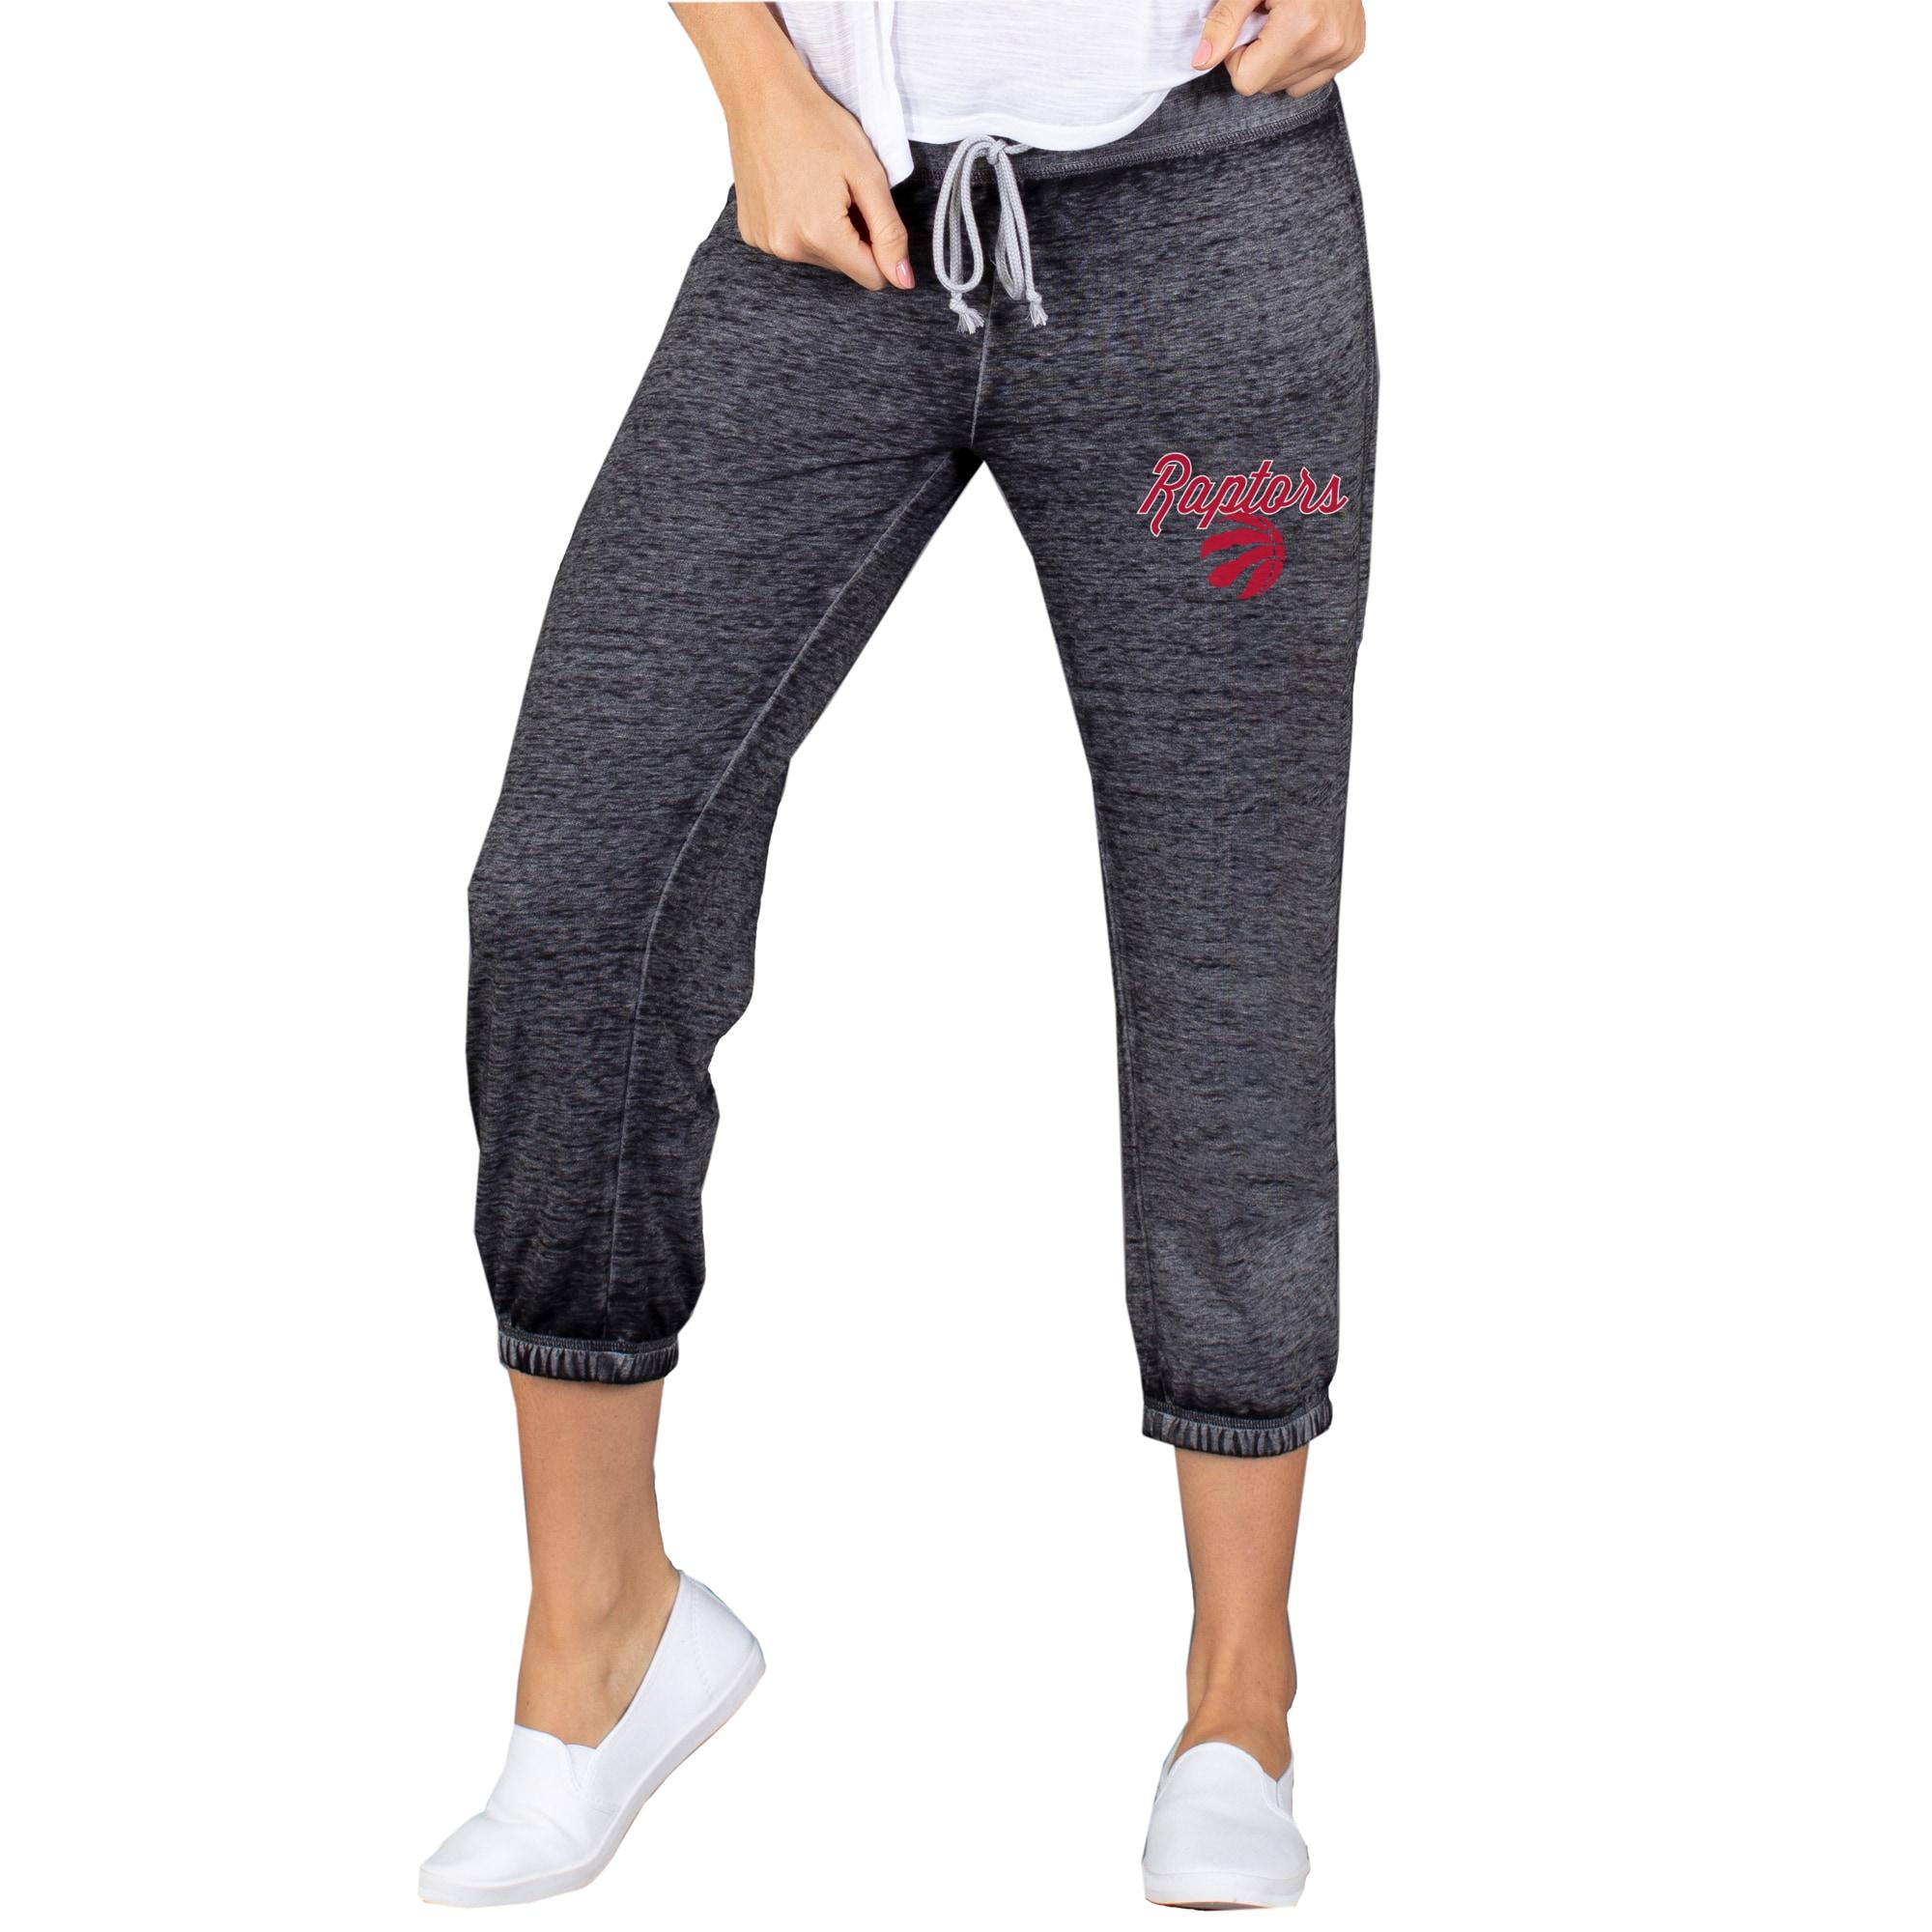 Toronto Raptors Concepts Sport Women's Capri Knit Lounge Pants - Charcoal